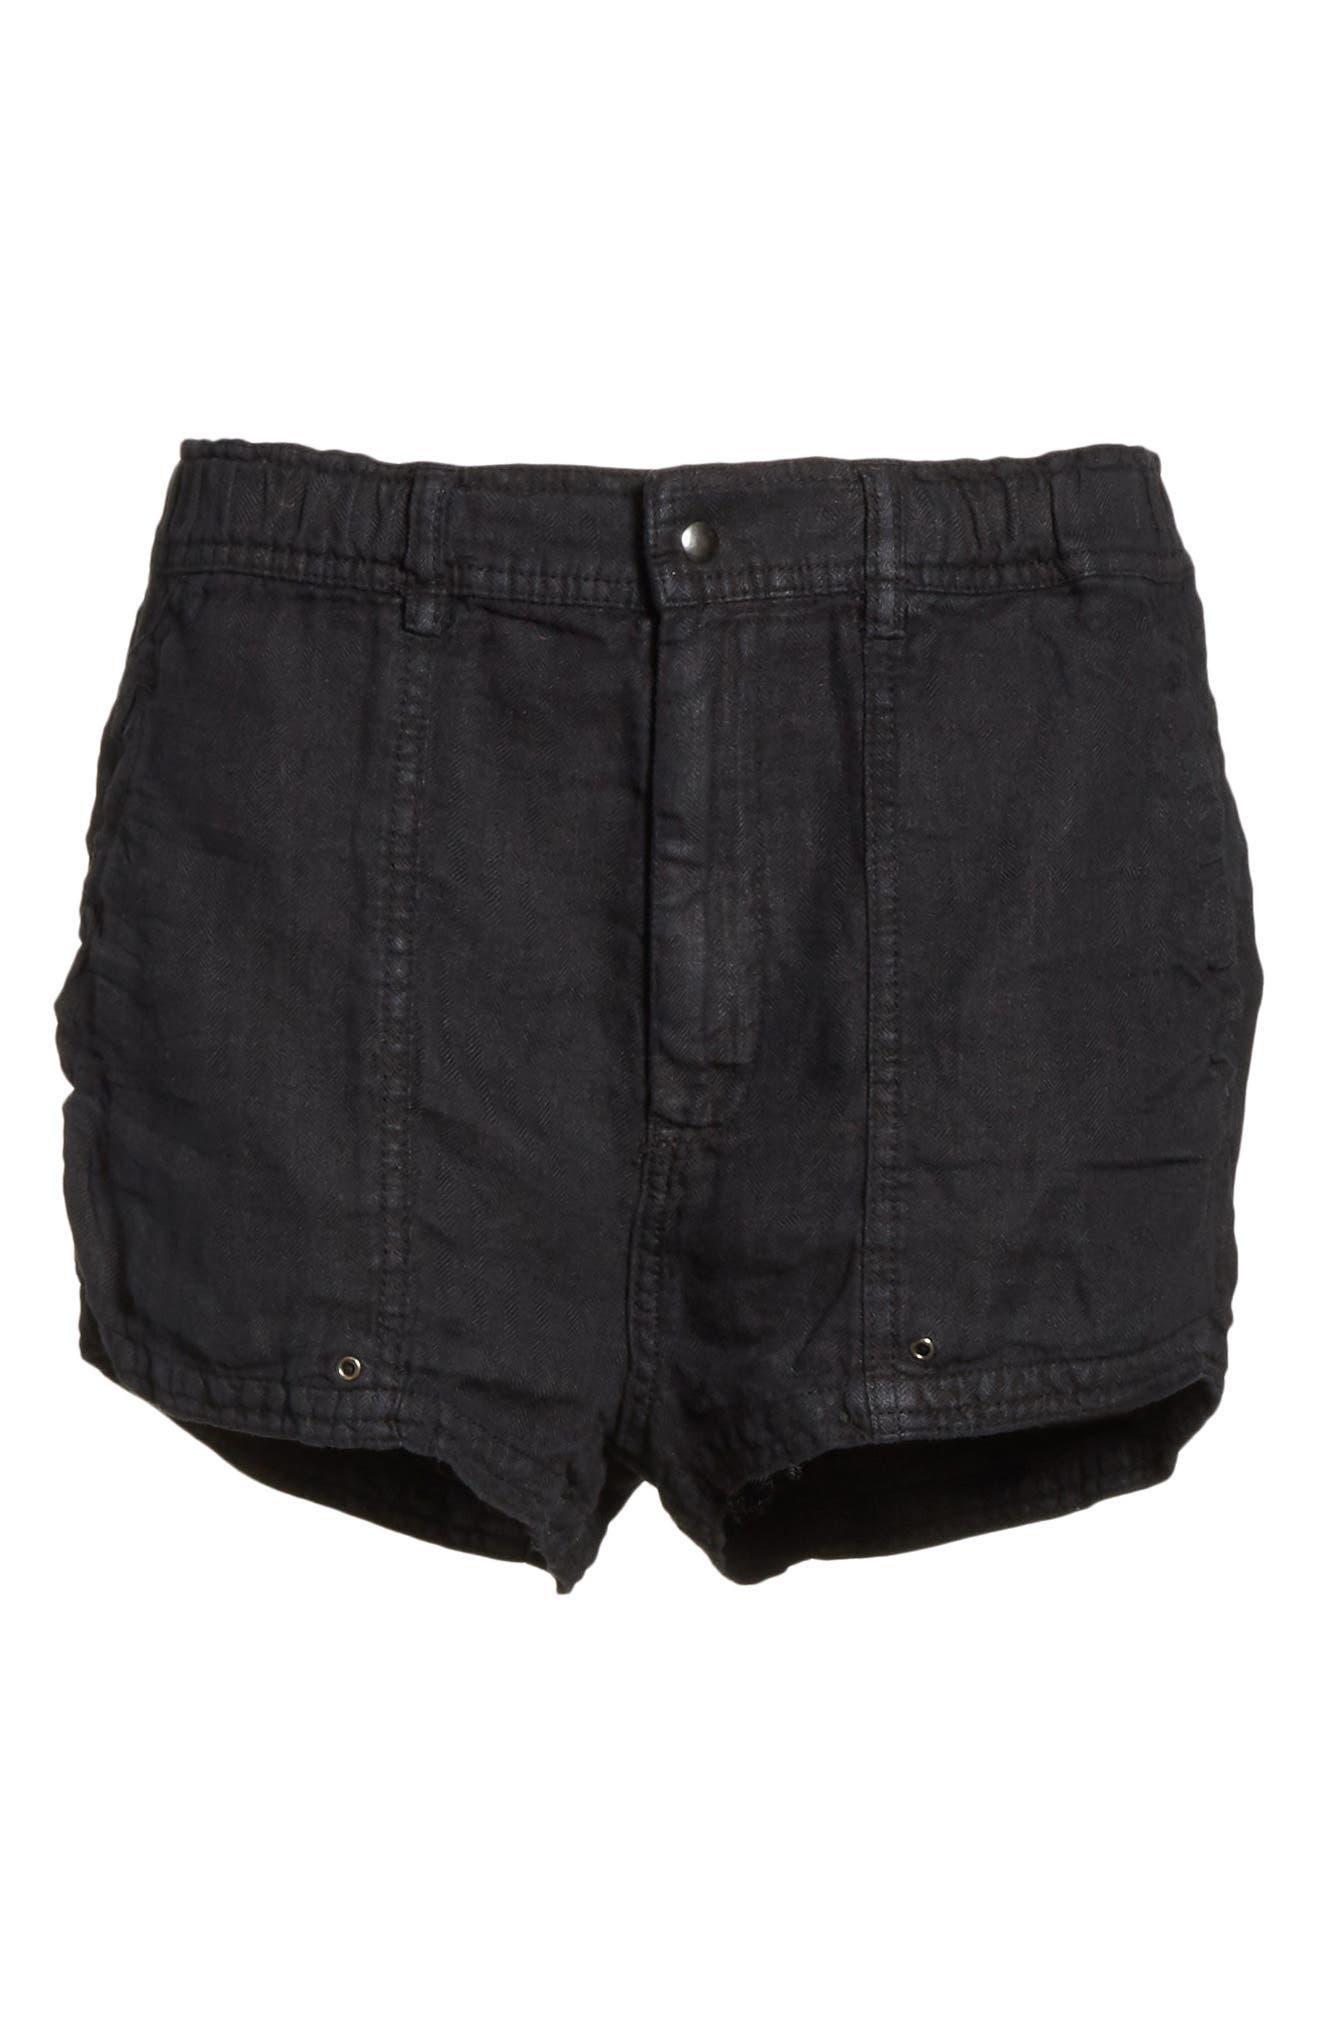 Beacon Utility Linen Shorts,                             Alternate thumbnail 6, color,                             001